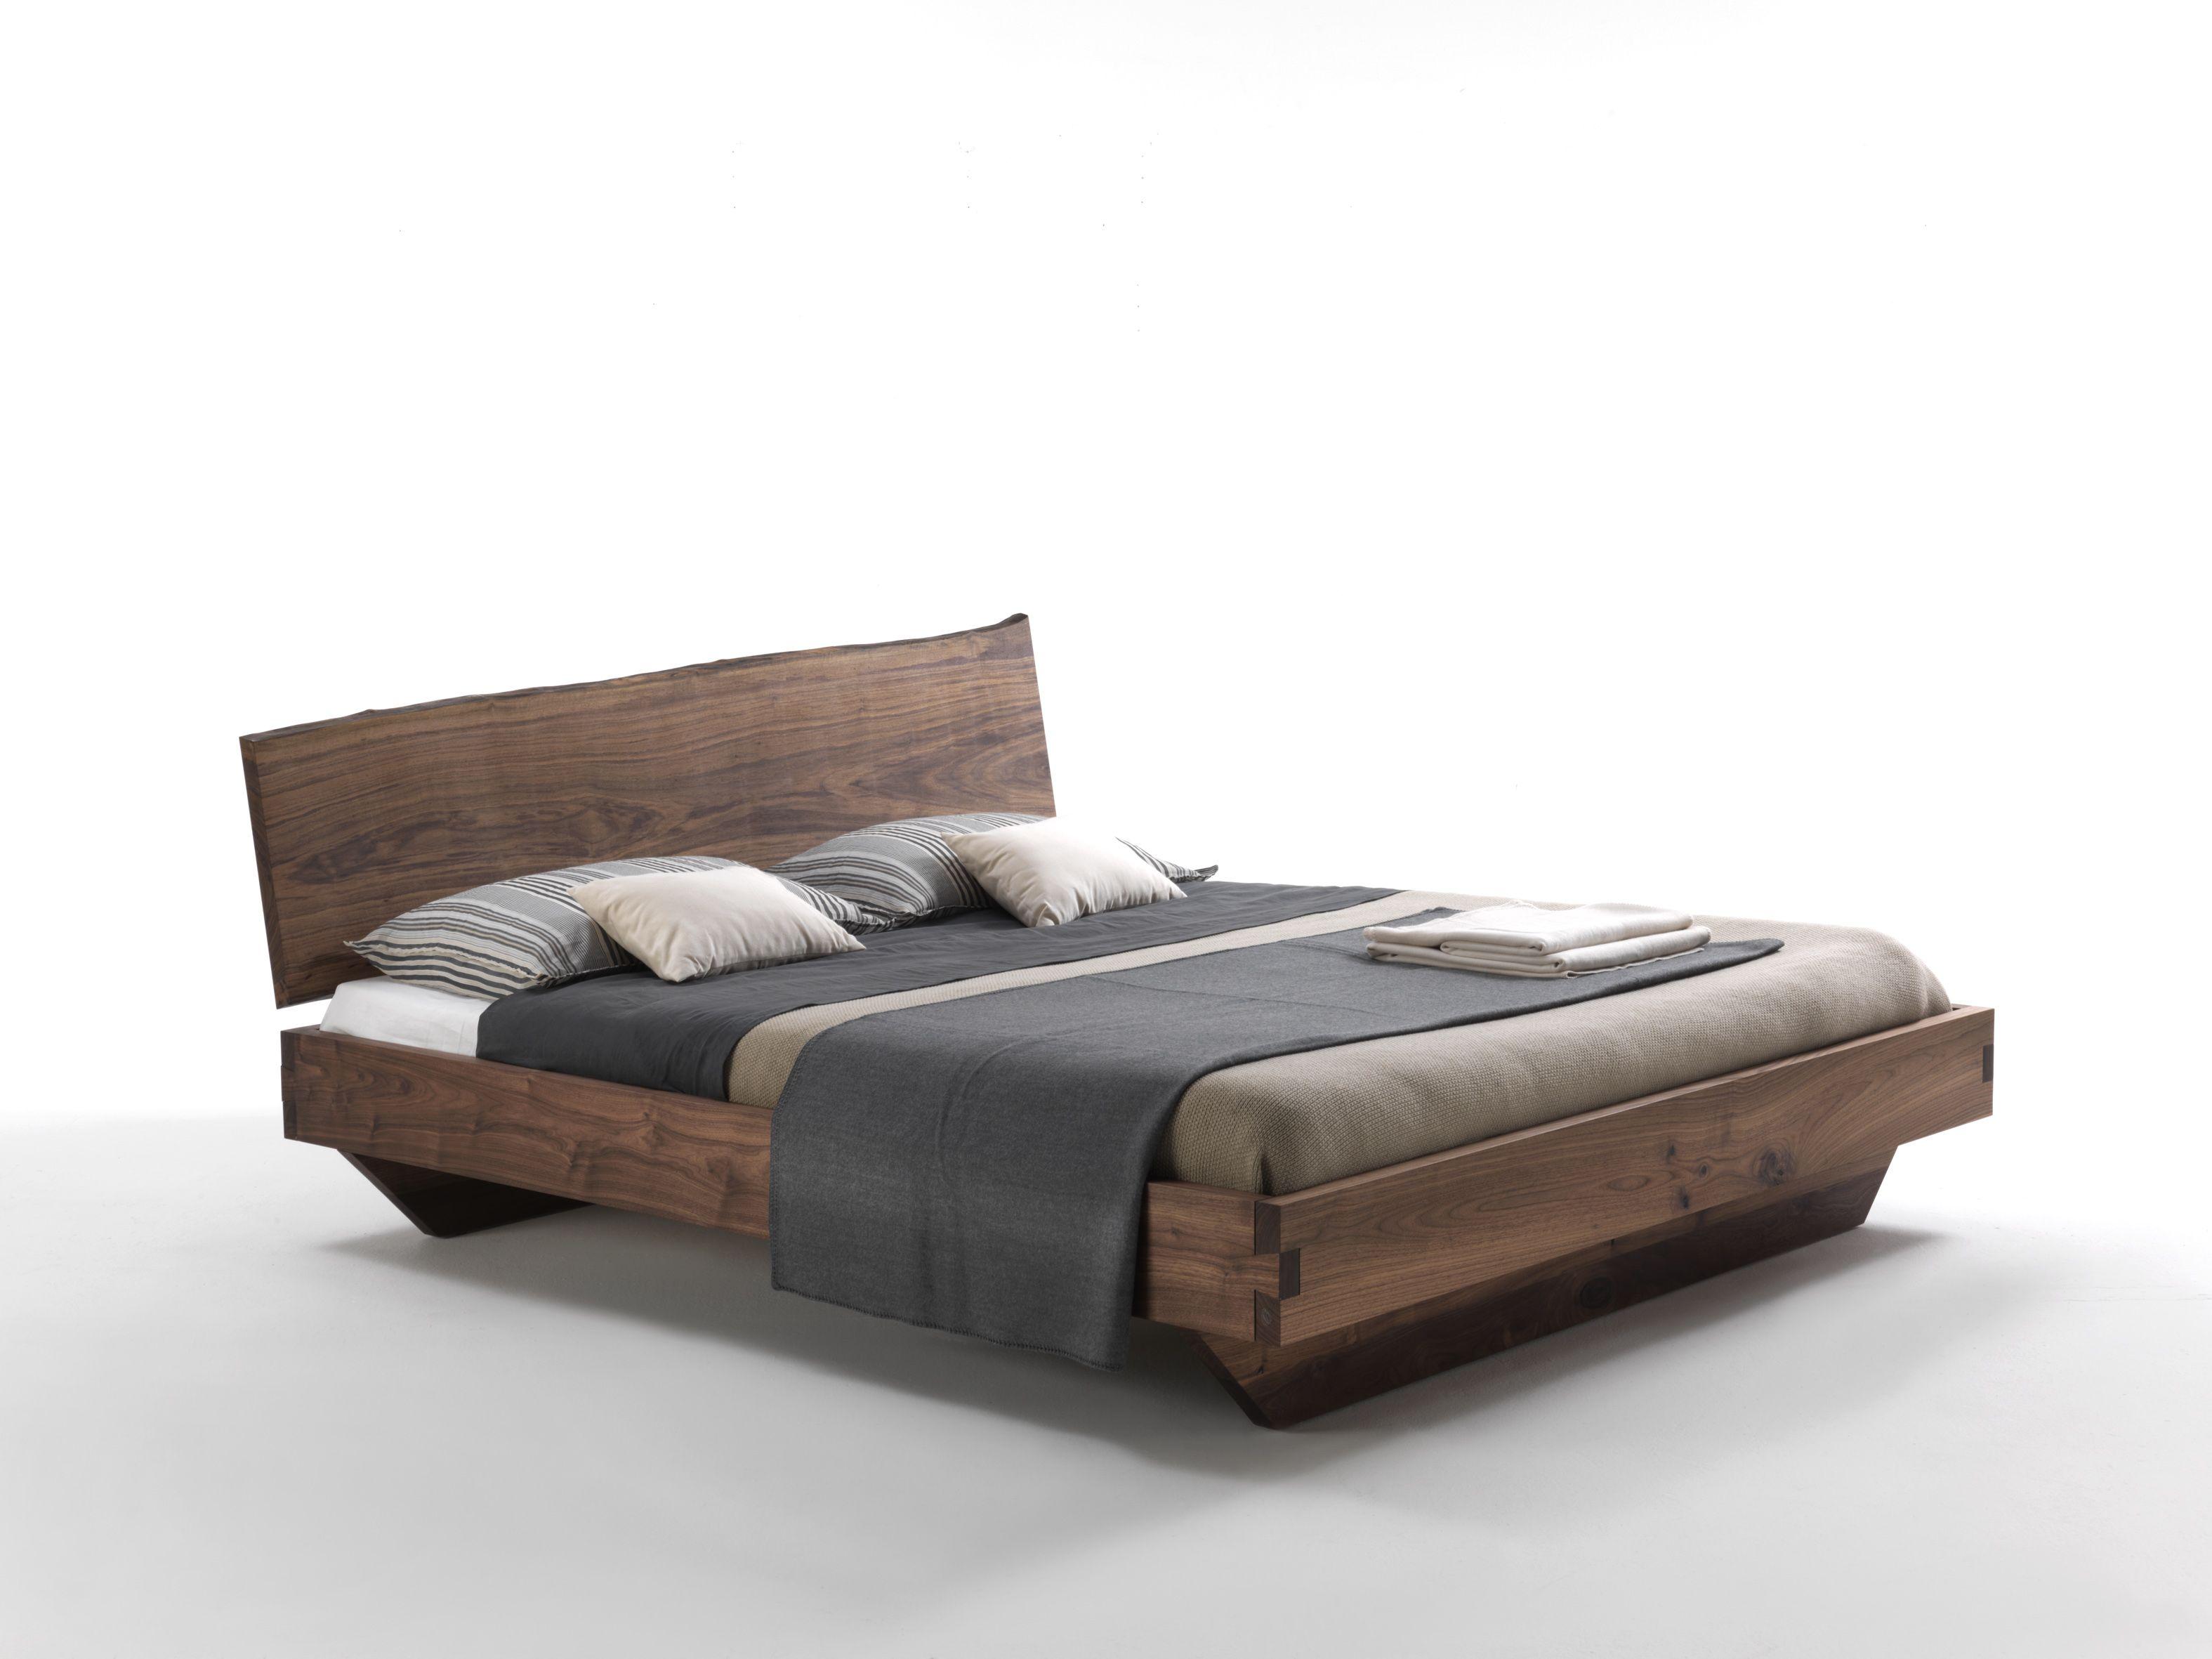 Pin von Monem Naifar auf m chambre Bett möbel, Bett